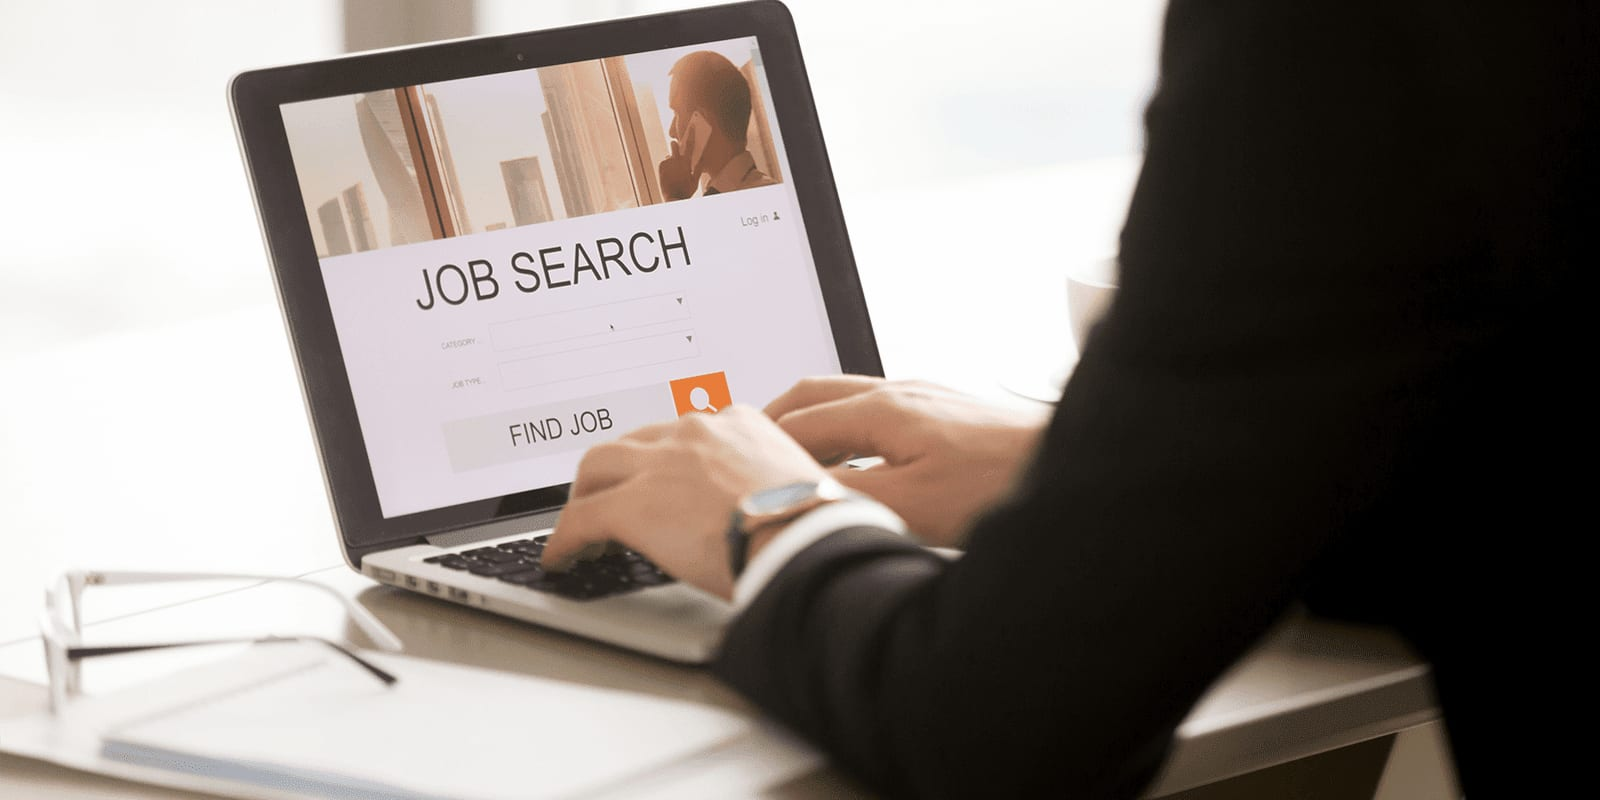 https://fjwp.s3.amazonaws.com/blog/wp-content/uploads/2020/03/11140107/find-remote-job.png